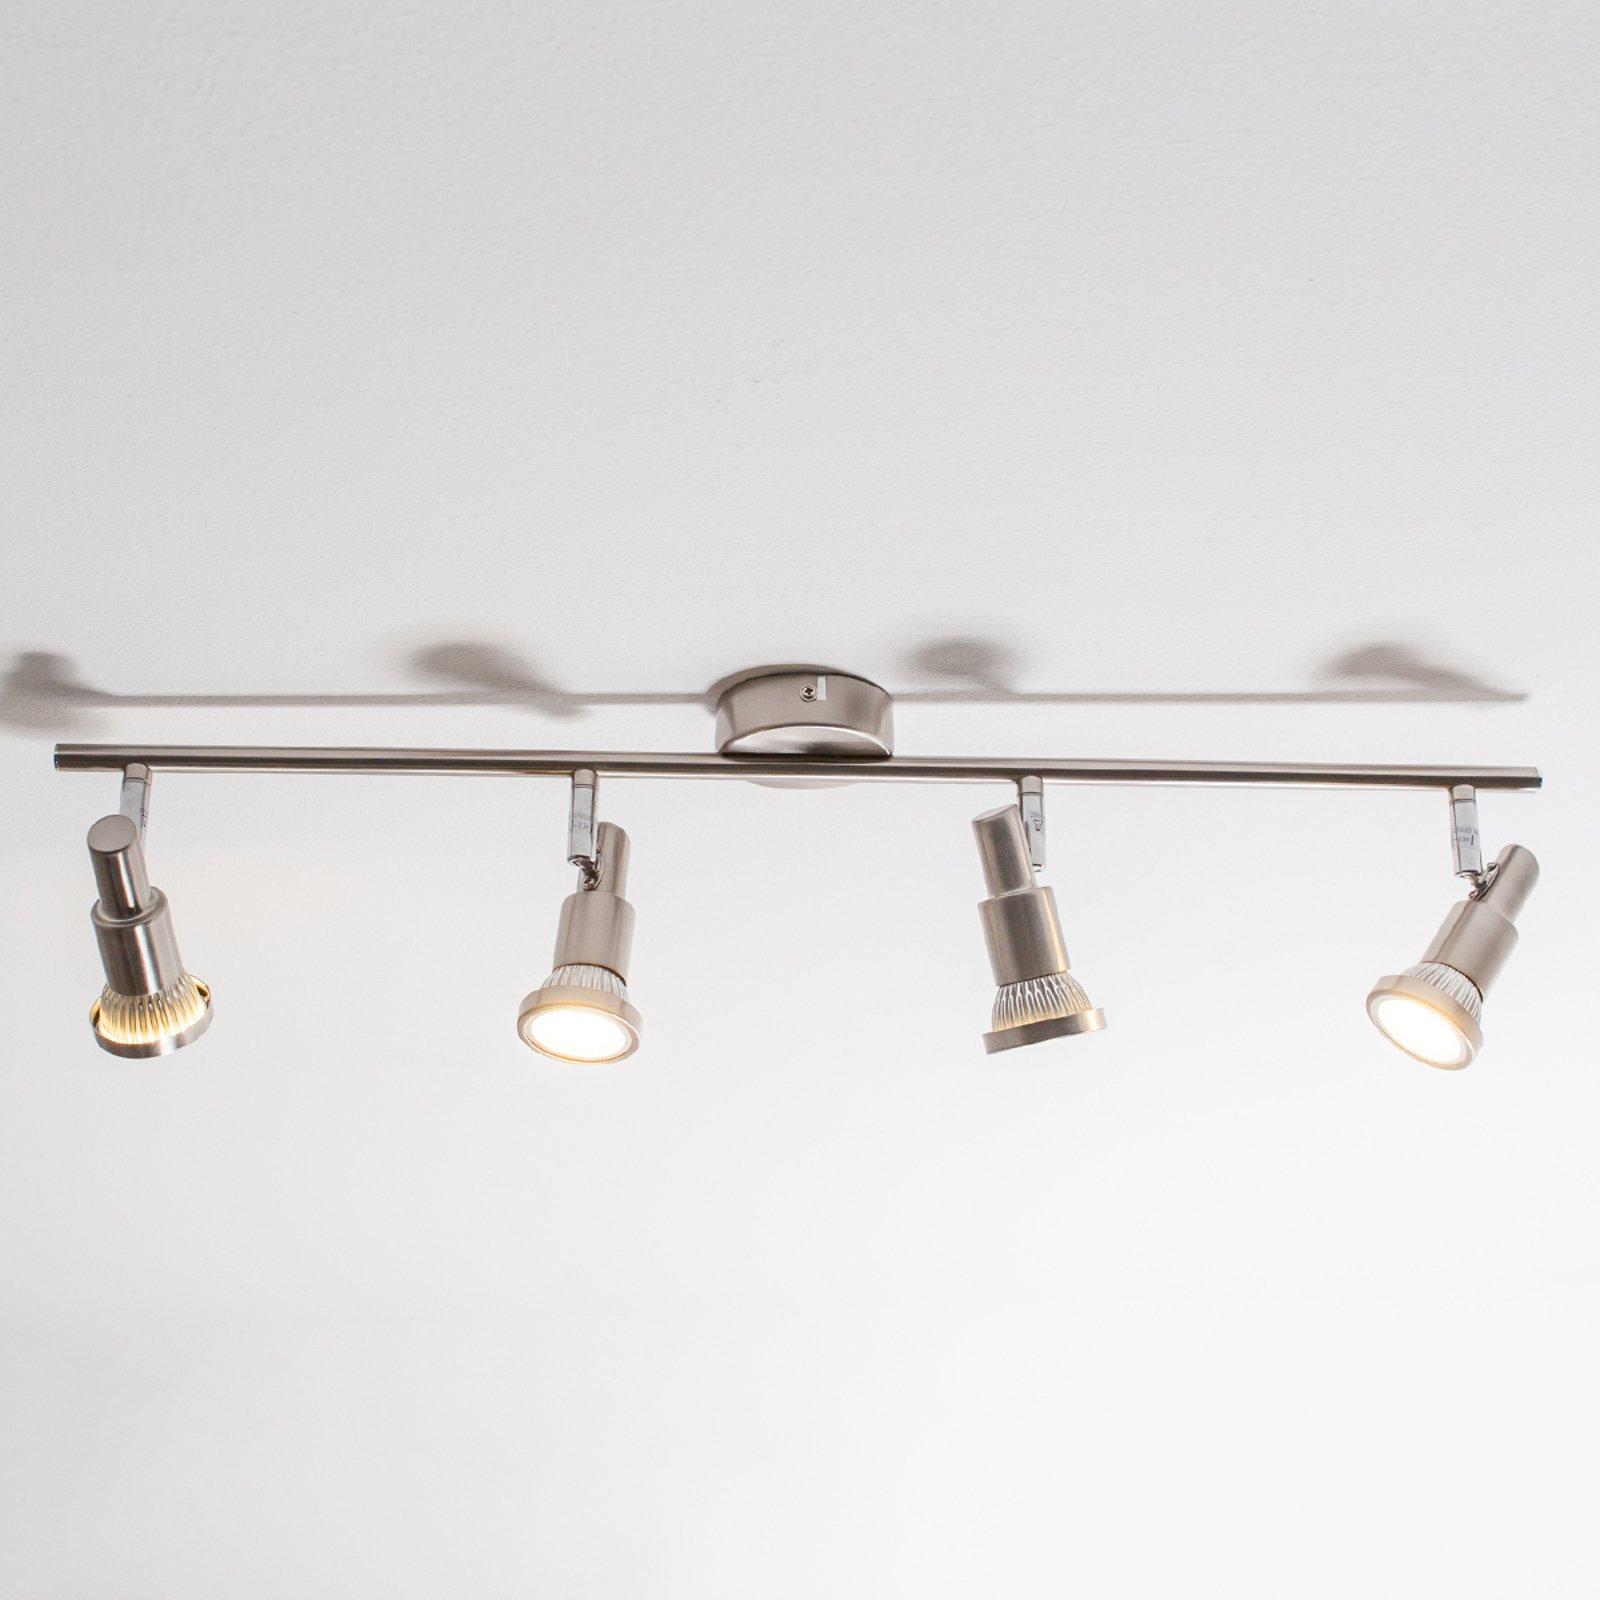 LED taklampe Aron med fire lyspunkter